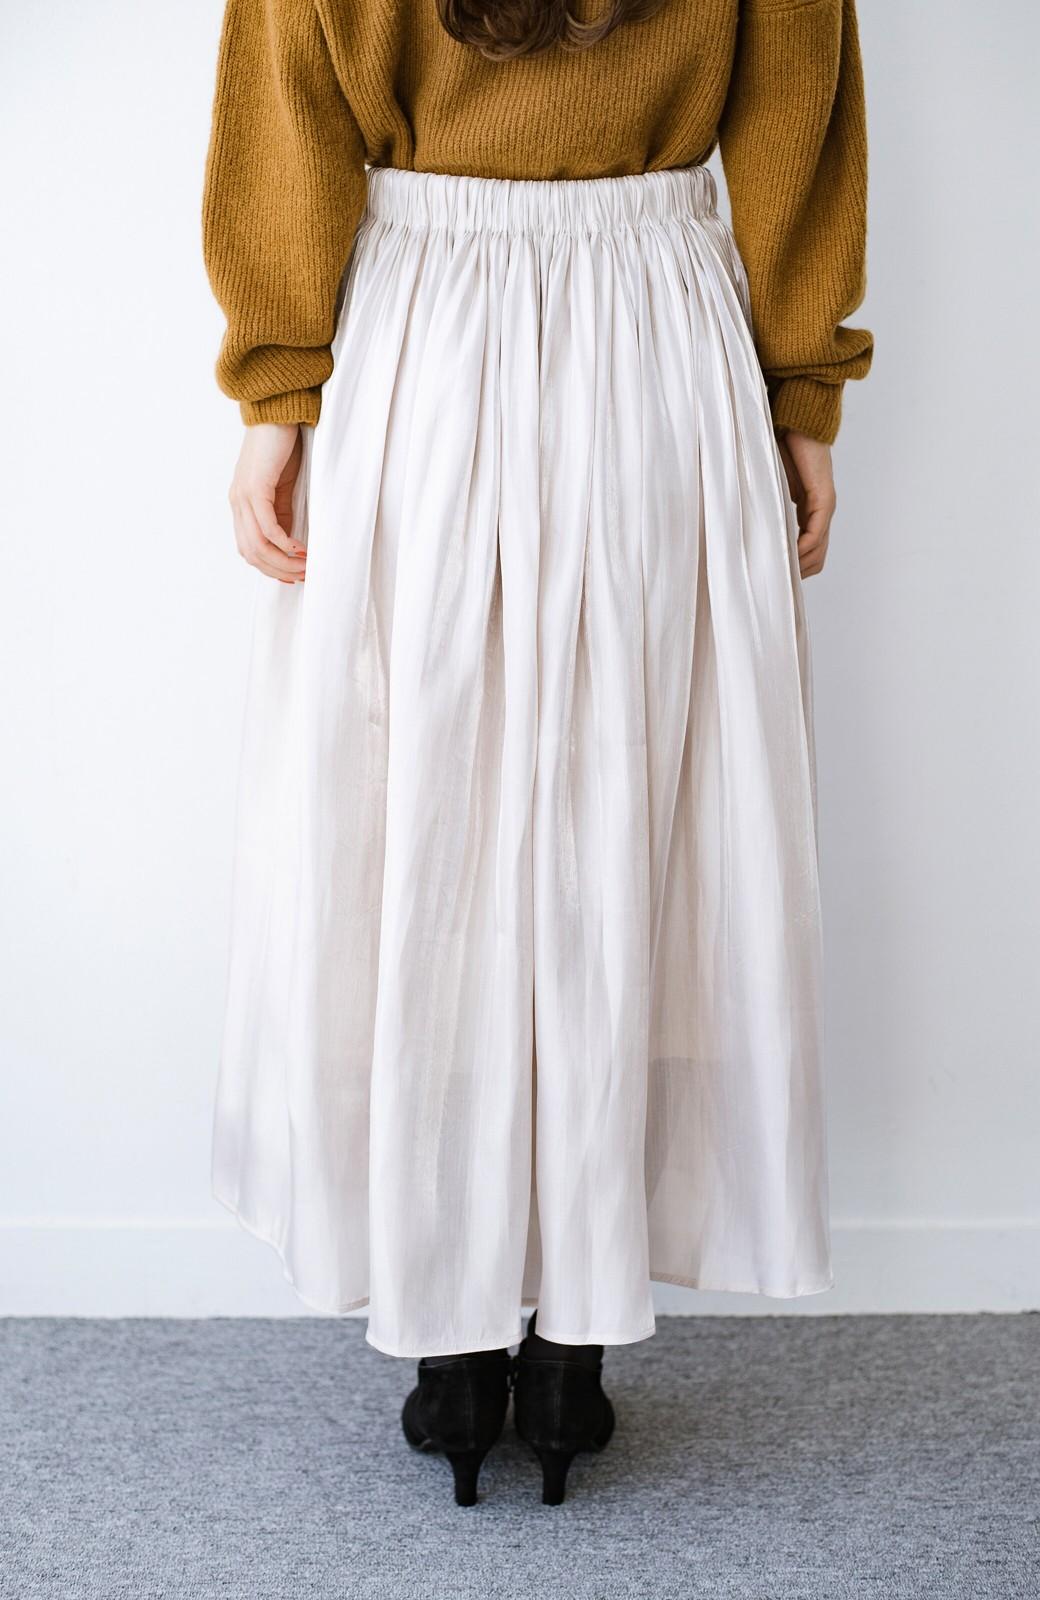 haco! 【人気のため新色追加!】1枚でも重ね着にも便利なキラキラ素材がかわいいロングスカート by laulea <アイボリー>の商品写真7